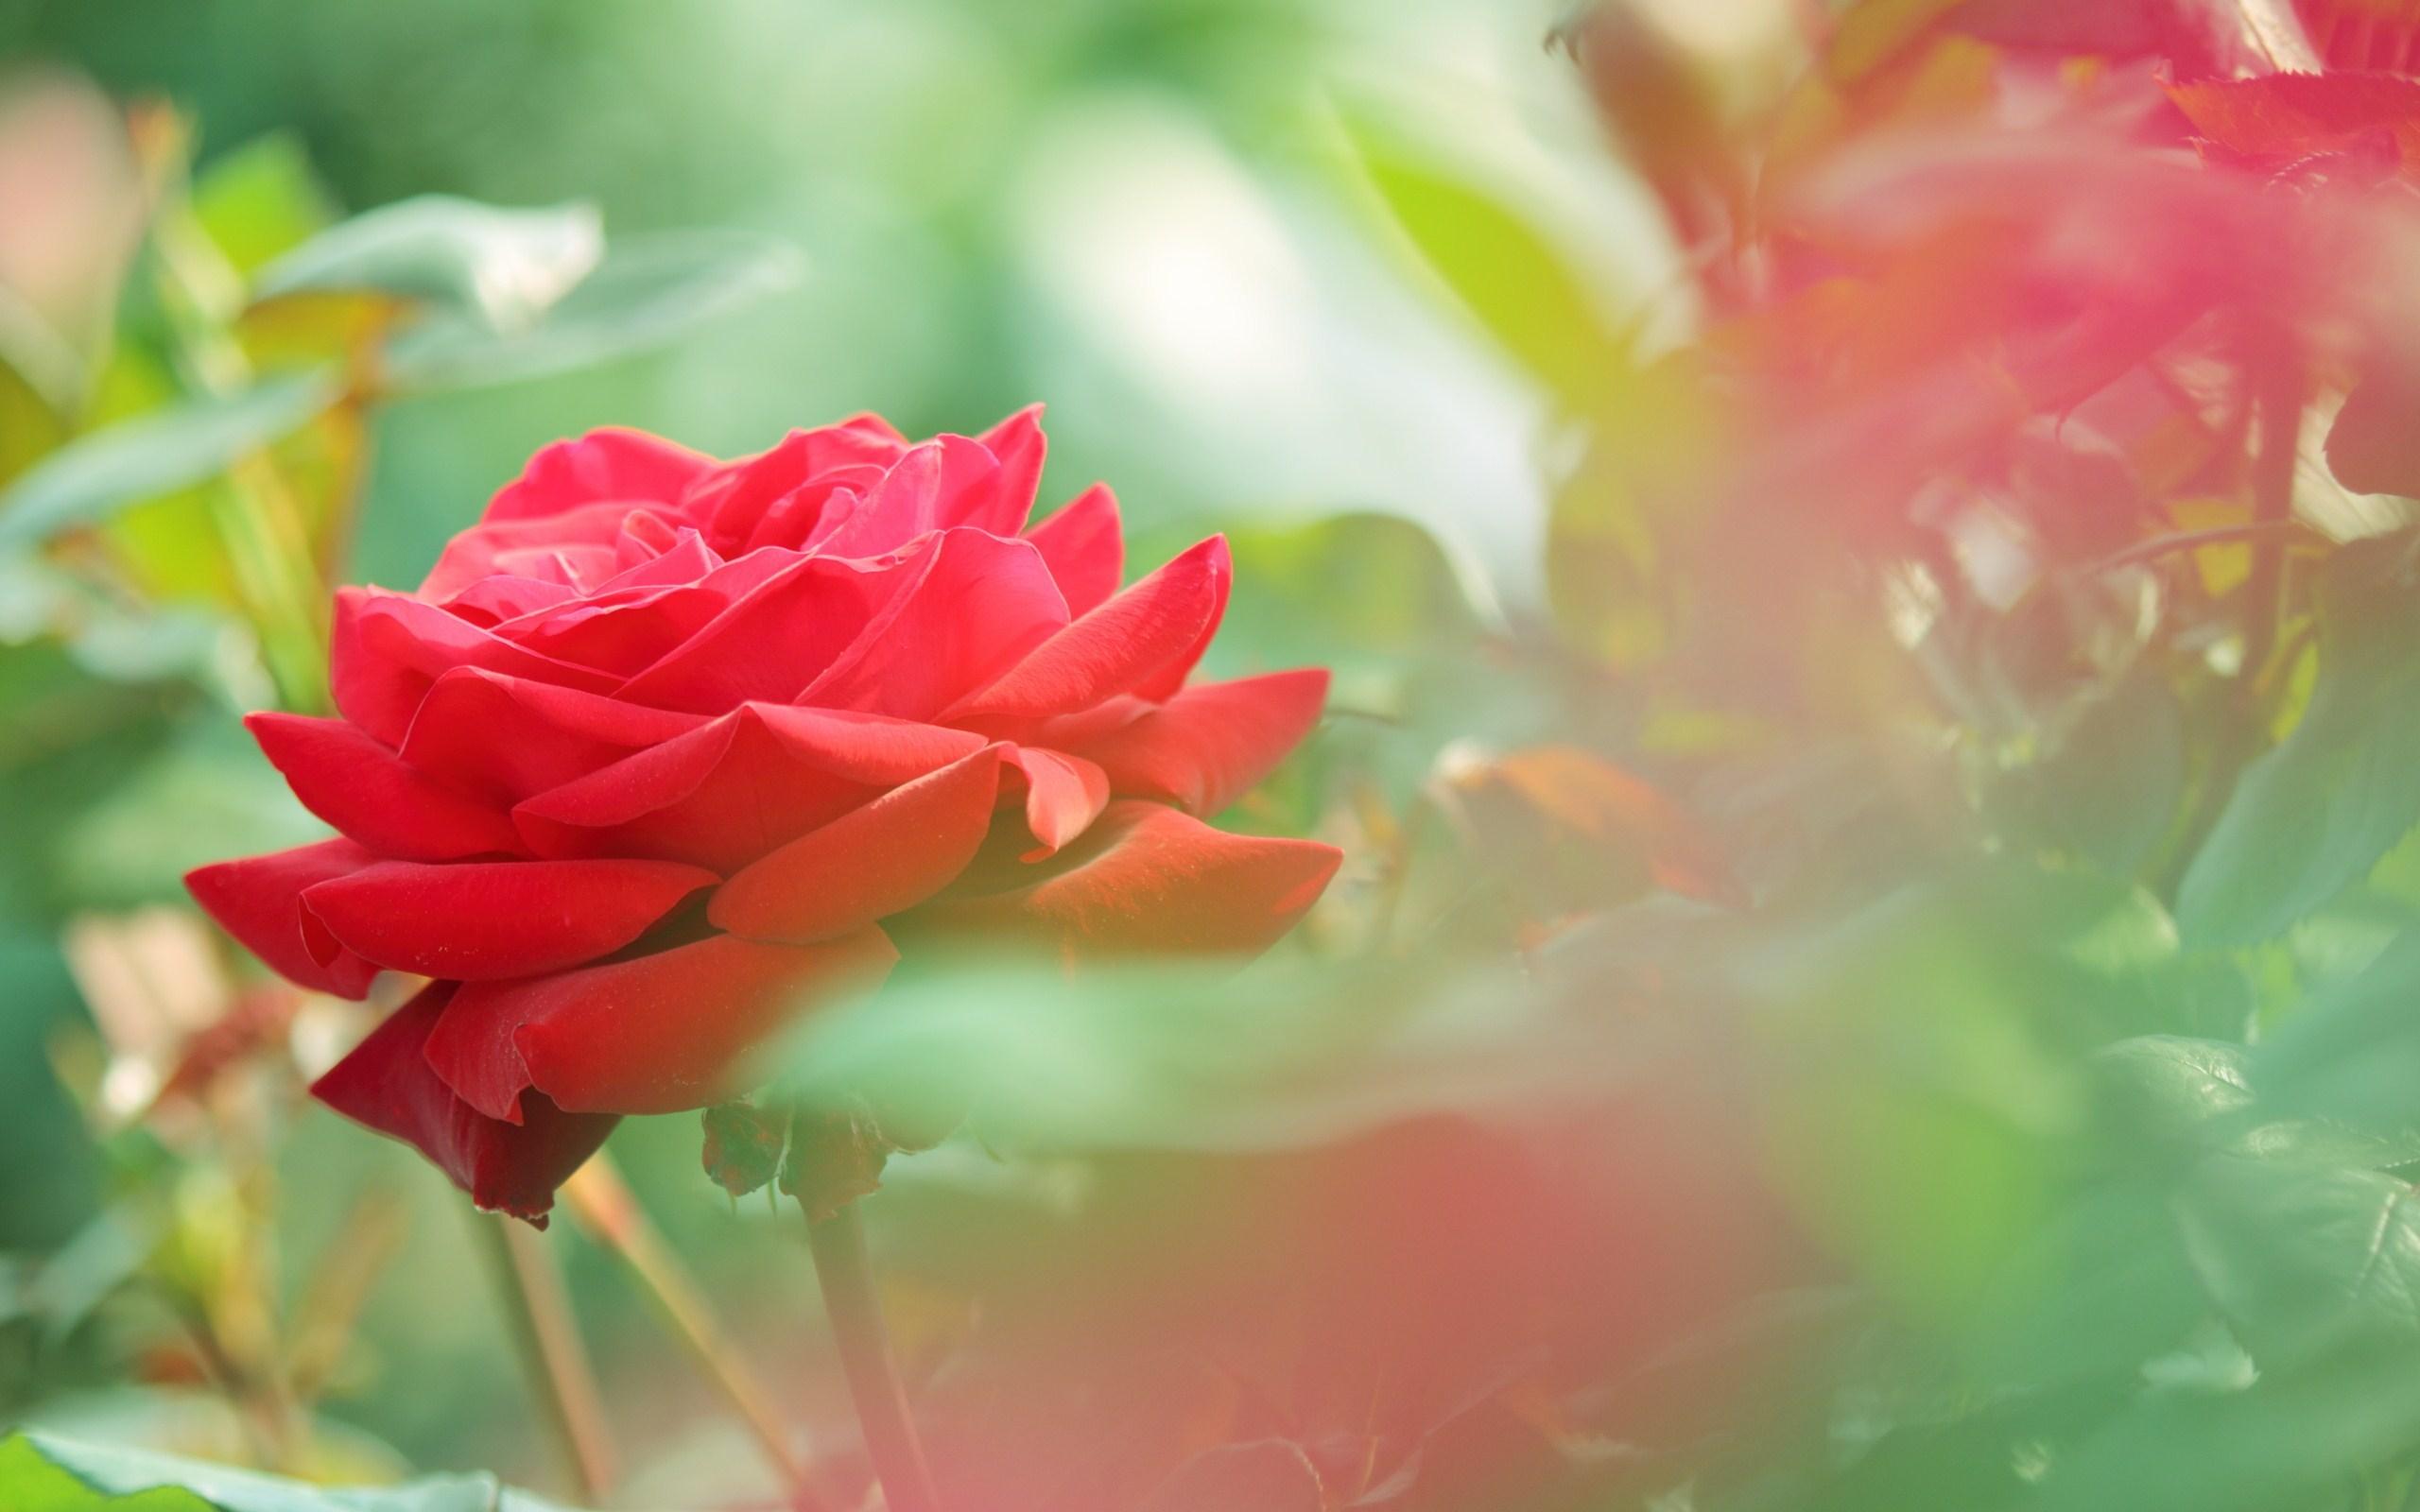 Beautiful Red Rose Flower Hd Wallpaper Good Morning Bible Quotes Tamil 1600x1000 Download Hd Wallpaper Wallpapertip